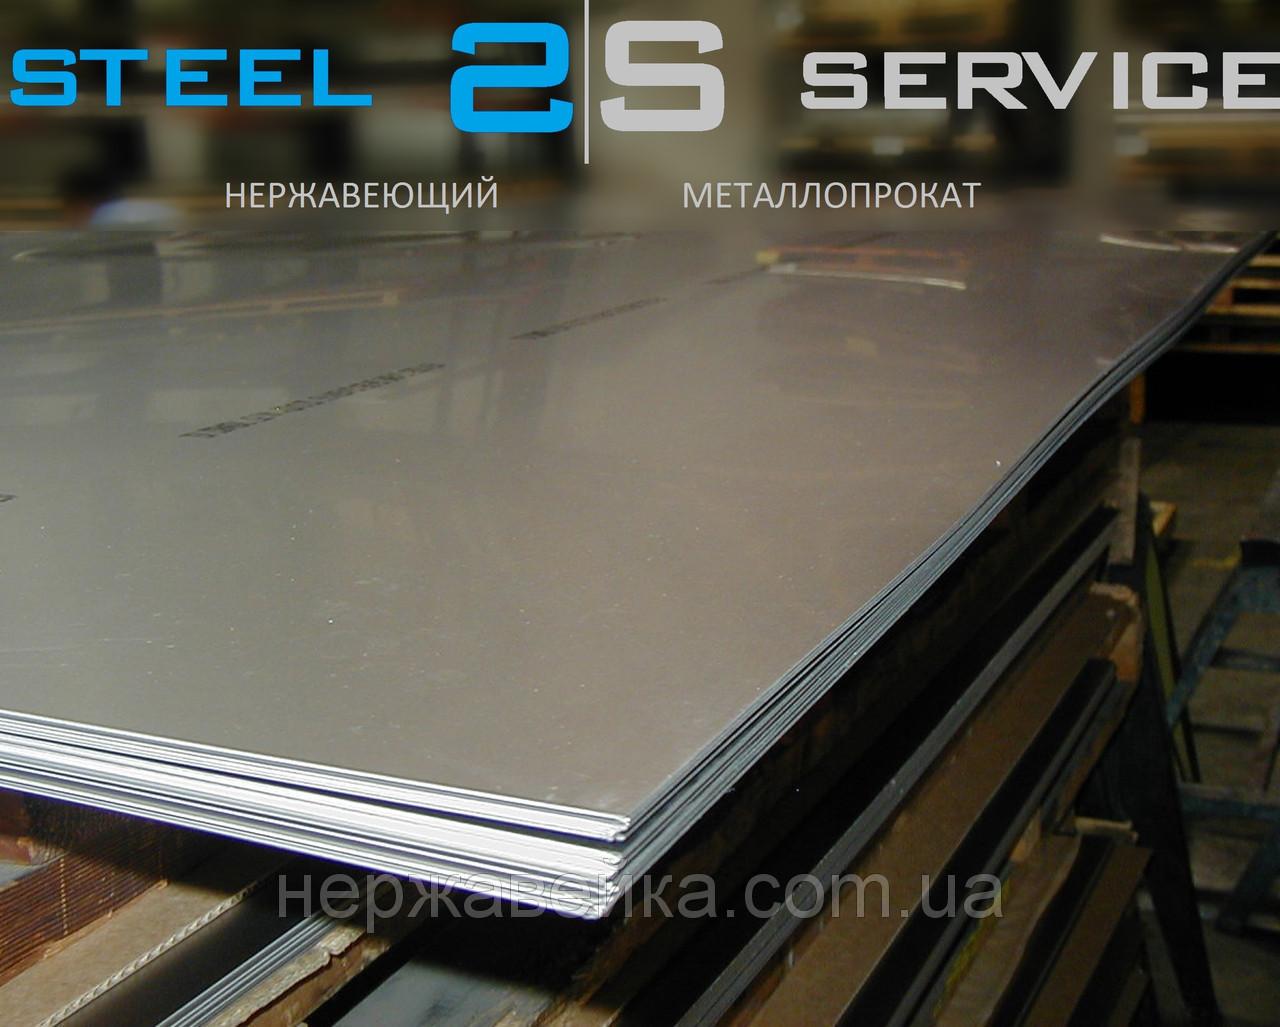 Нержавеющий лист 0,8х1500х3000мм AISI 430(12Х17) 4N - шлифованный, технический